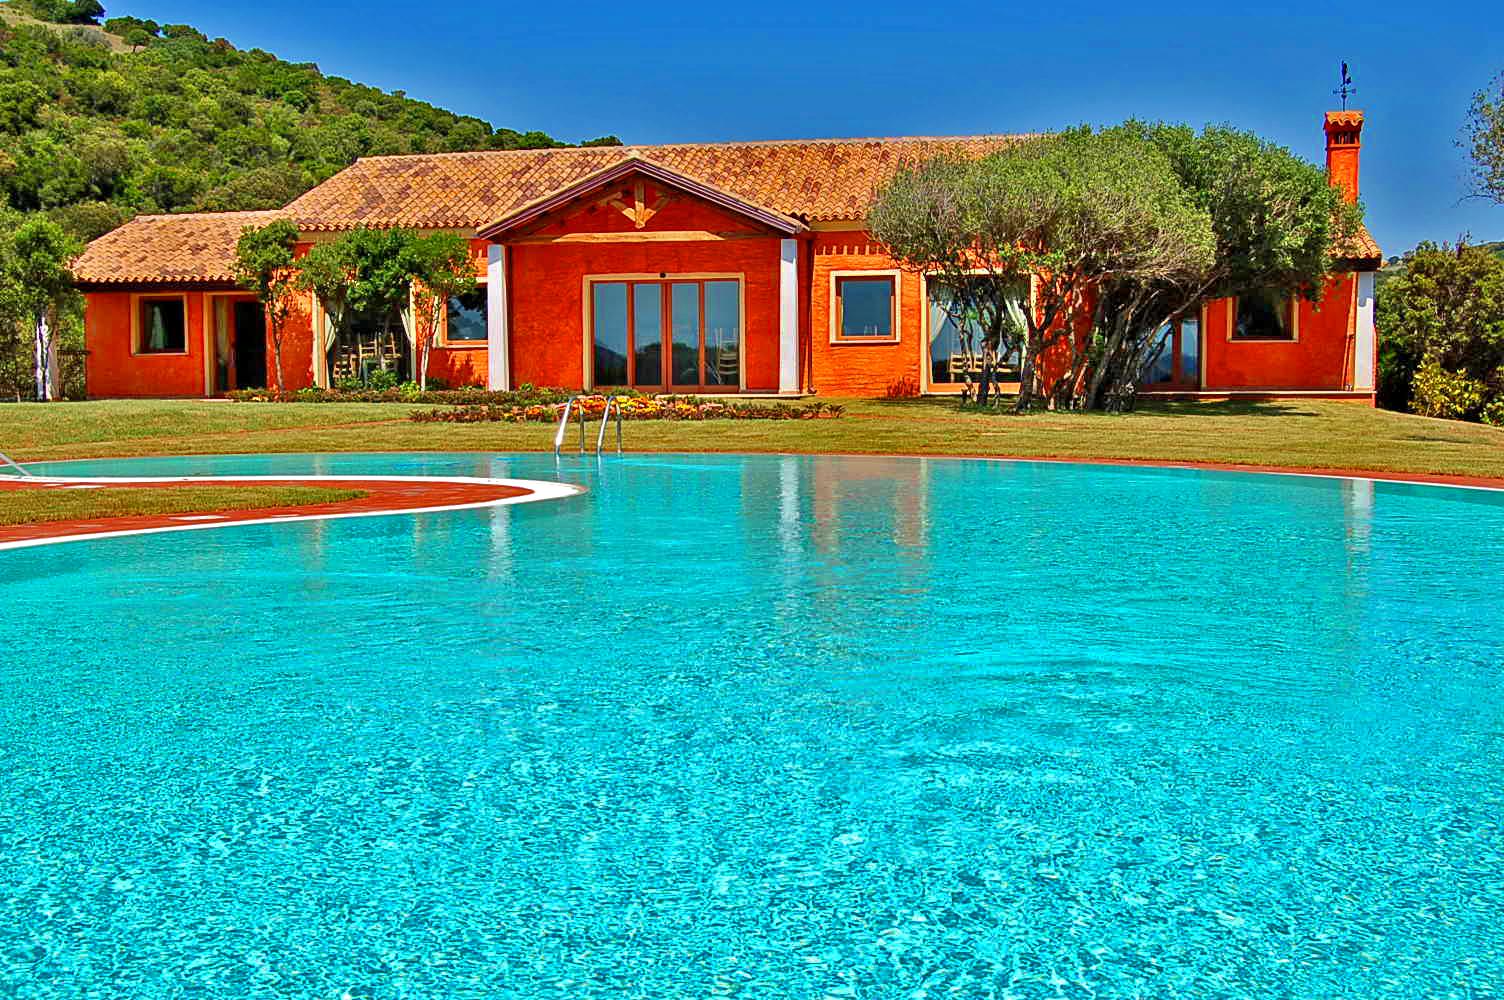 Aldiola county resort hotel sant antonio gallura for Hotels sardaigne